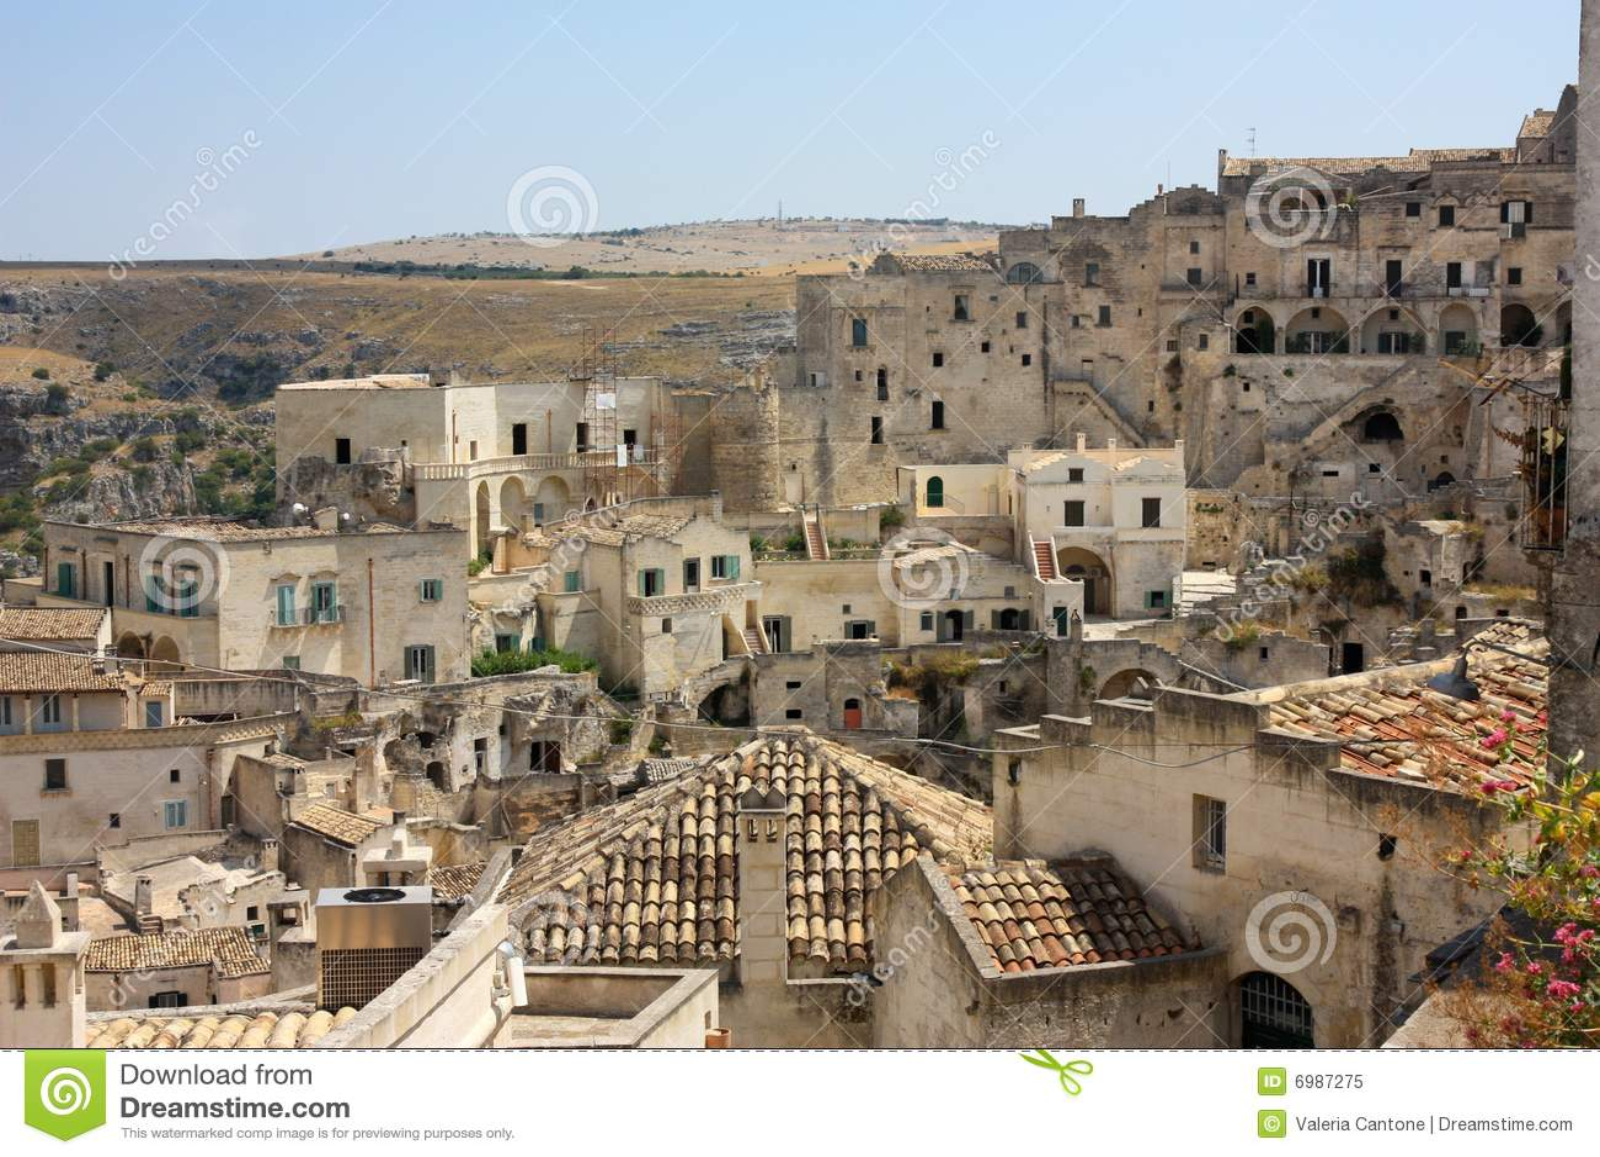 Matera, Basilicata, Italy Royalty Free Stock Photo - Image: 6987275